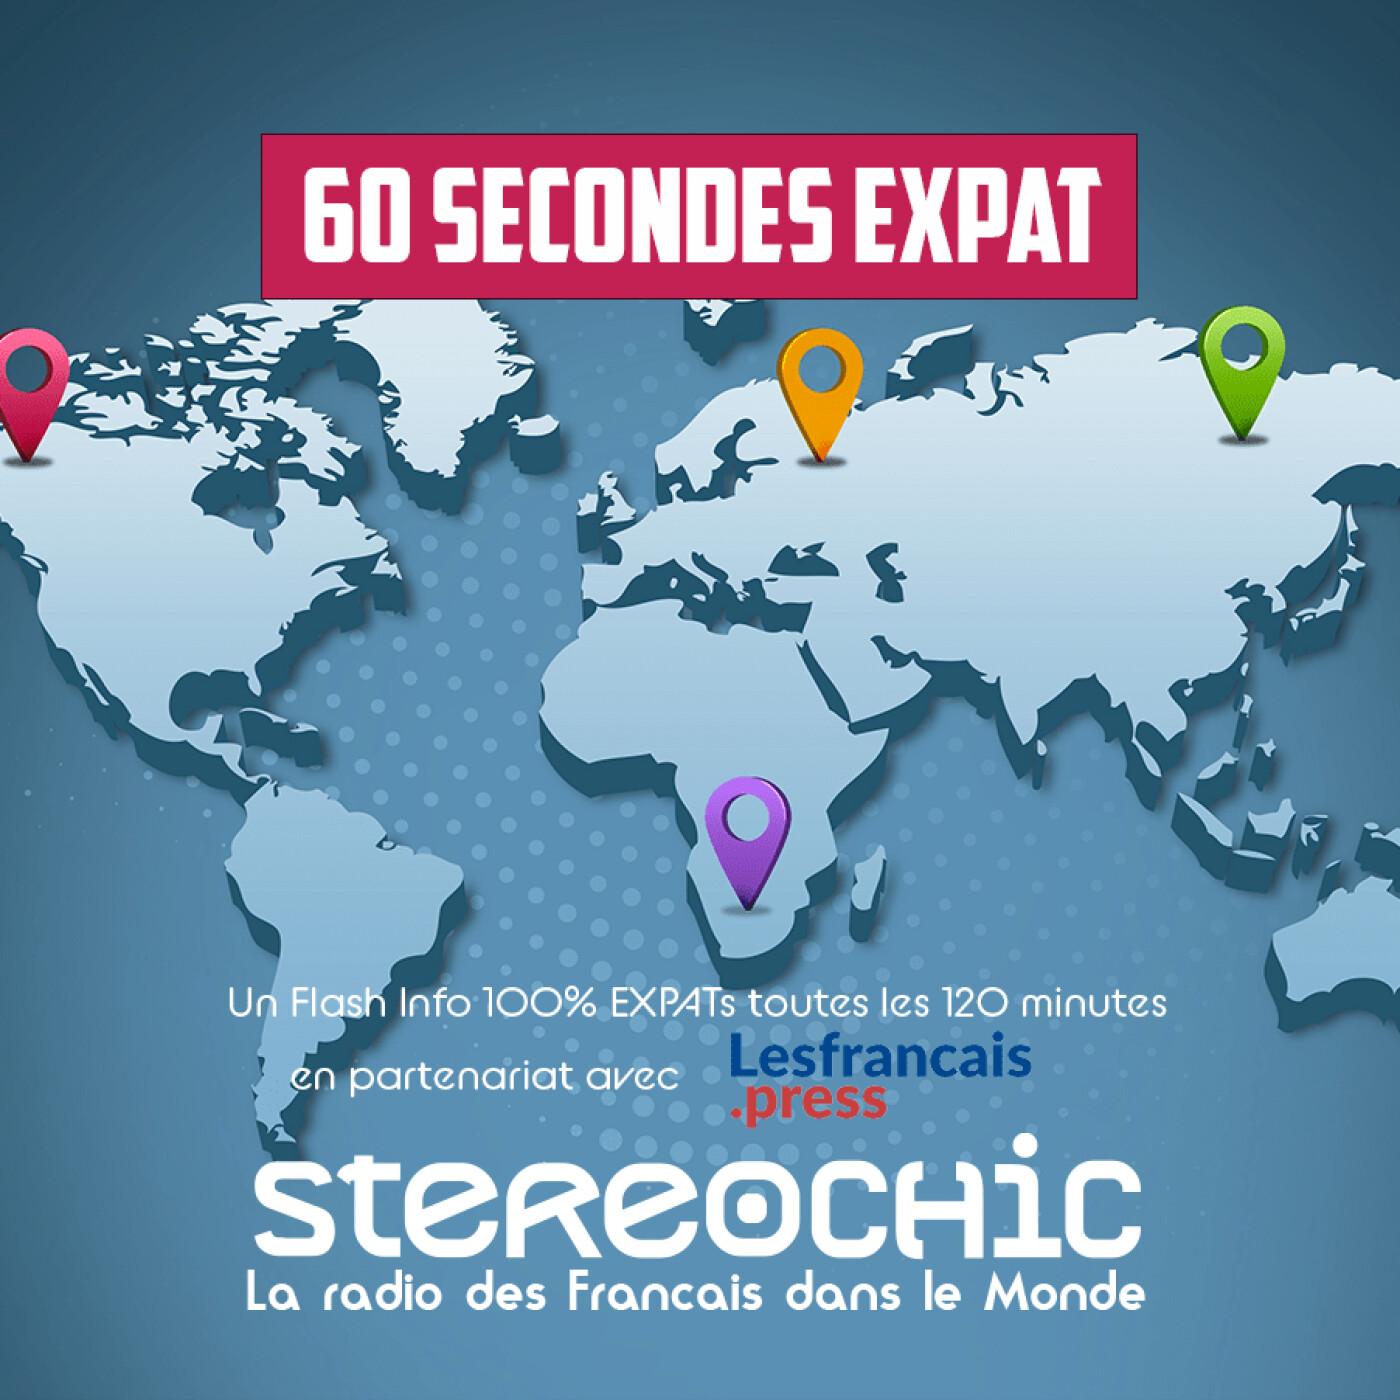 "Dernier Flash ""60 s Expat"" de la saison - 23 07 2021 - StereoChic Radio"